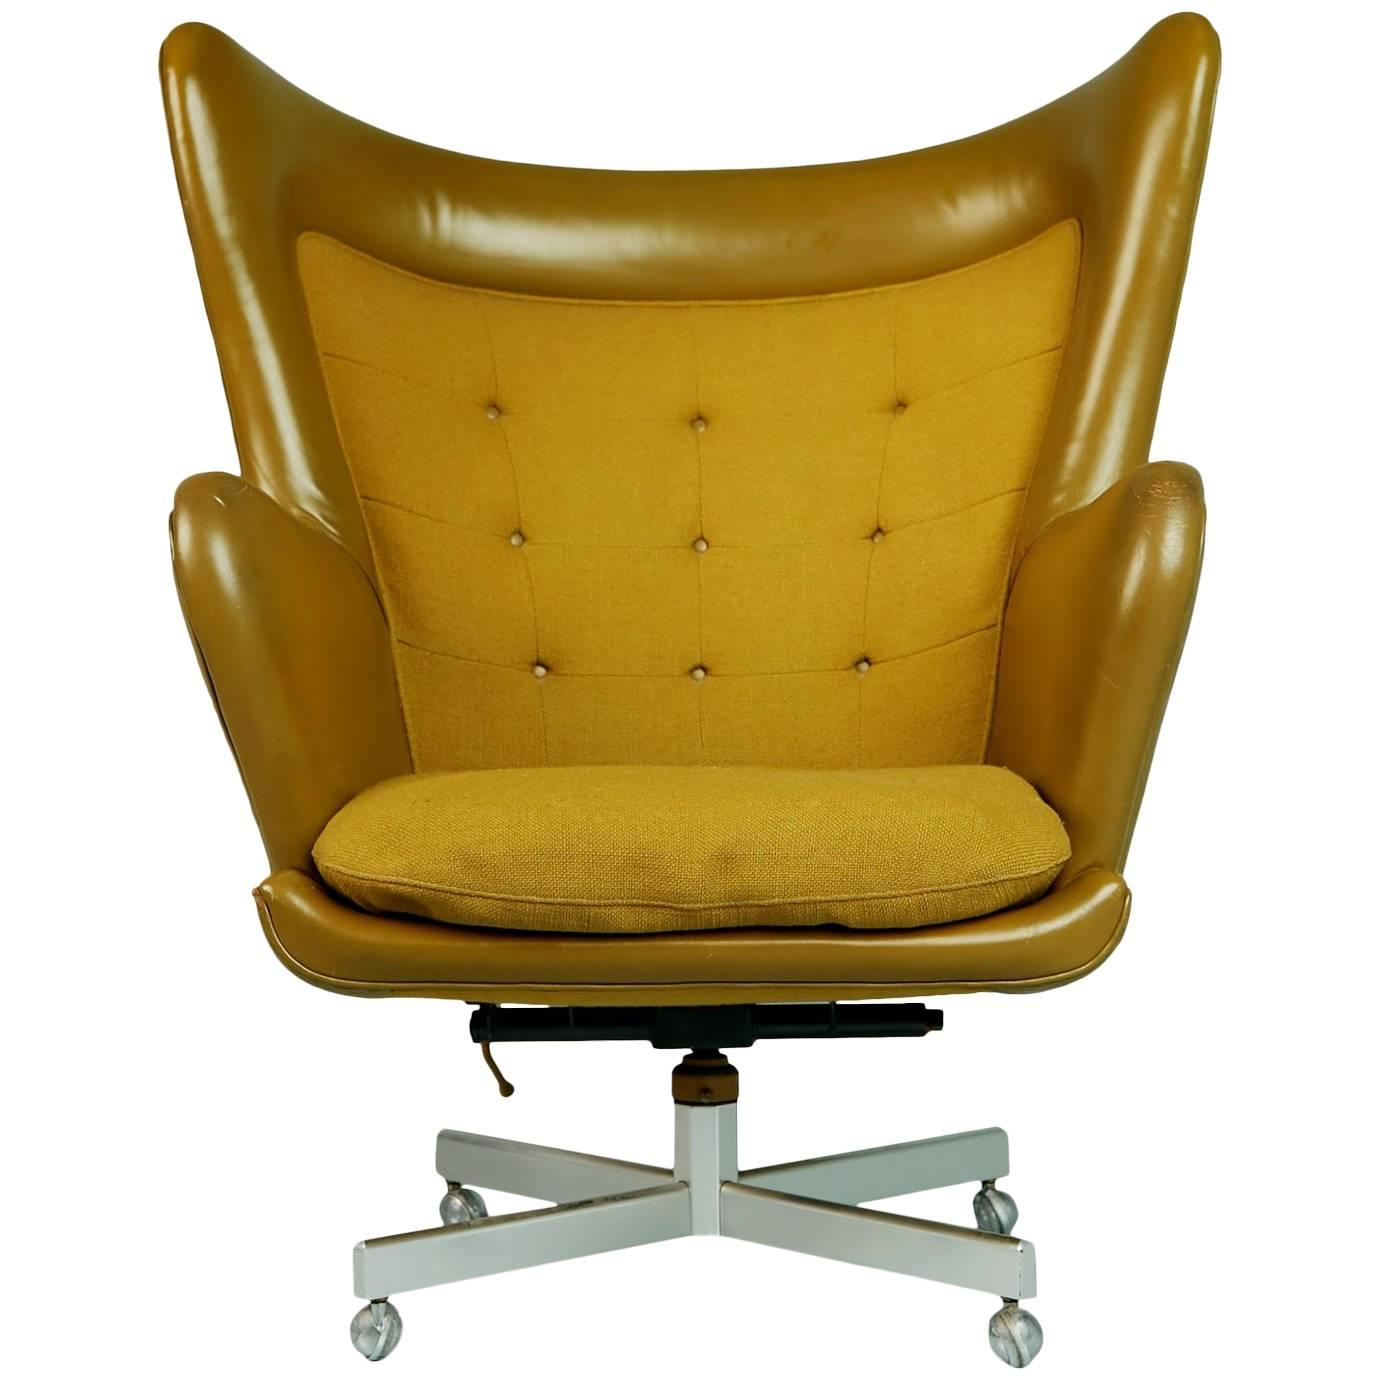 George Kasparian Leather Wingback Executive Chair, circa 1960